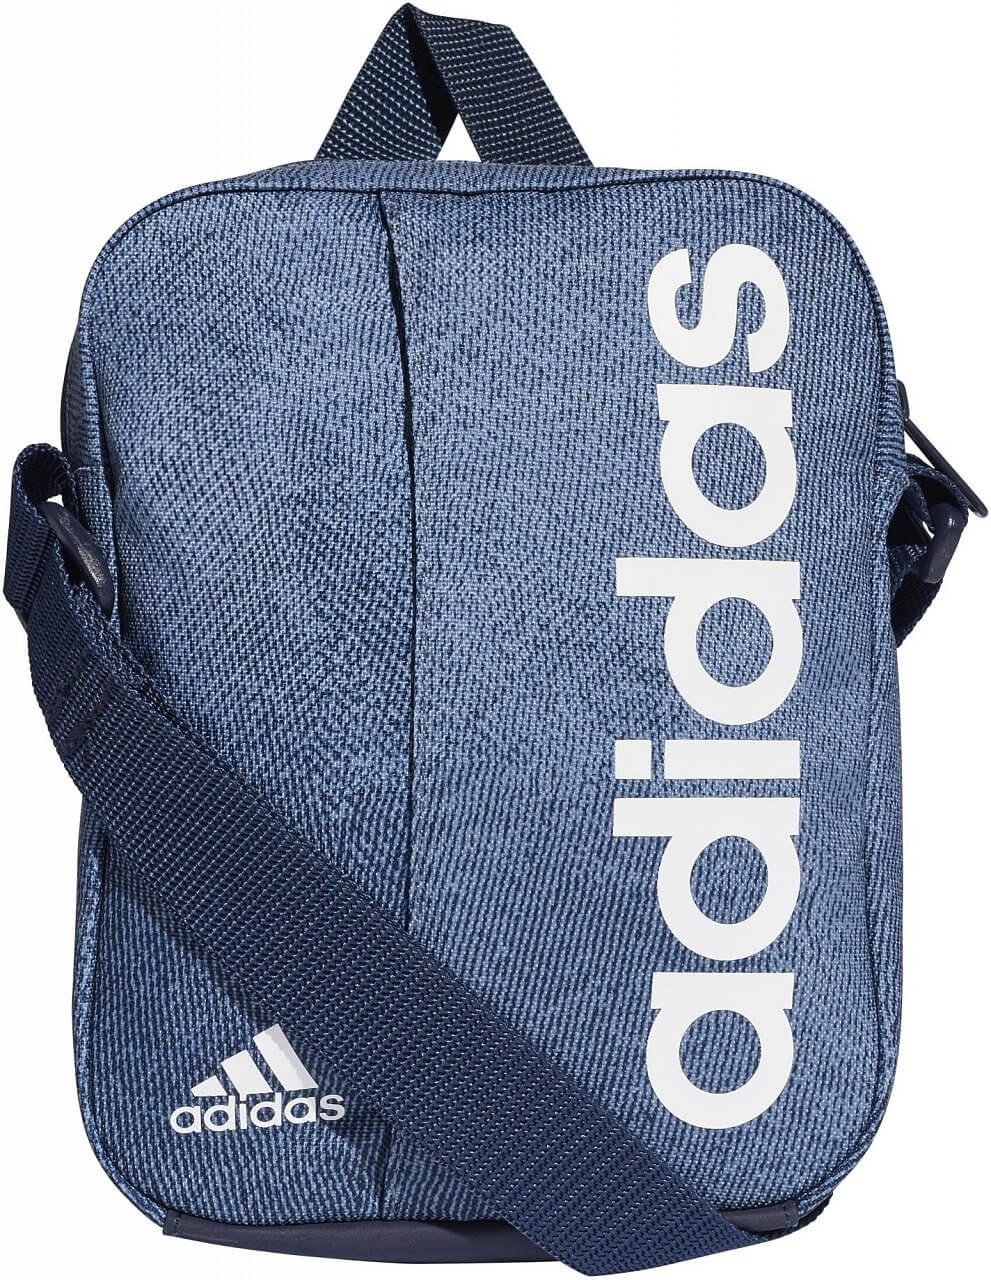 Sportovní taška adidas Linear Performance Organizer